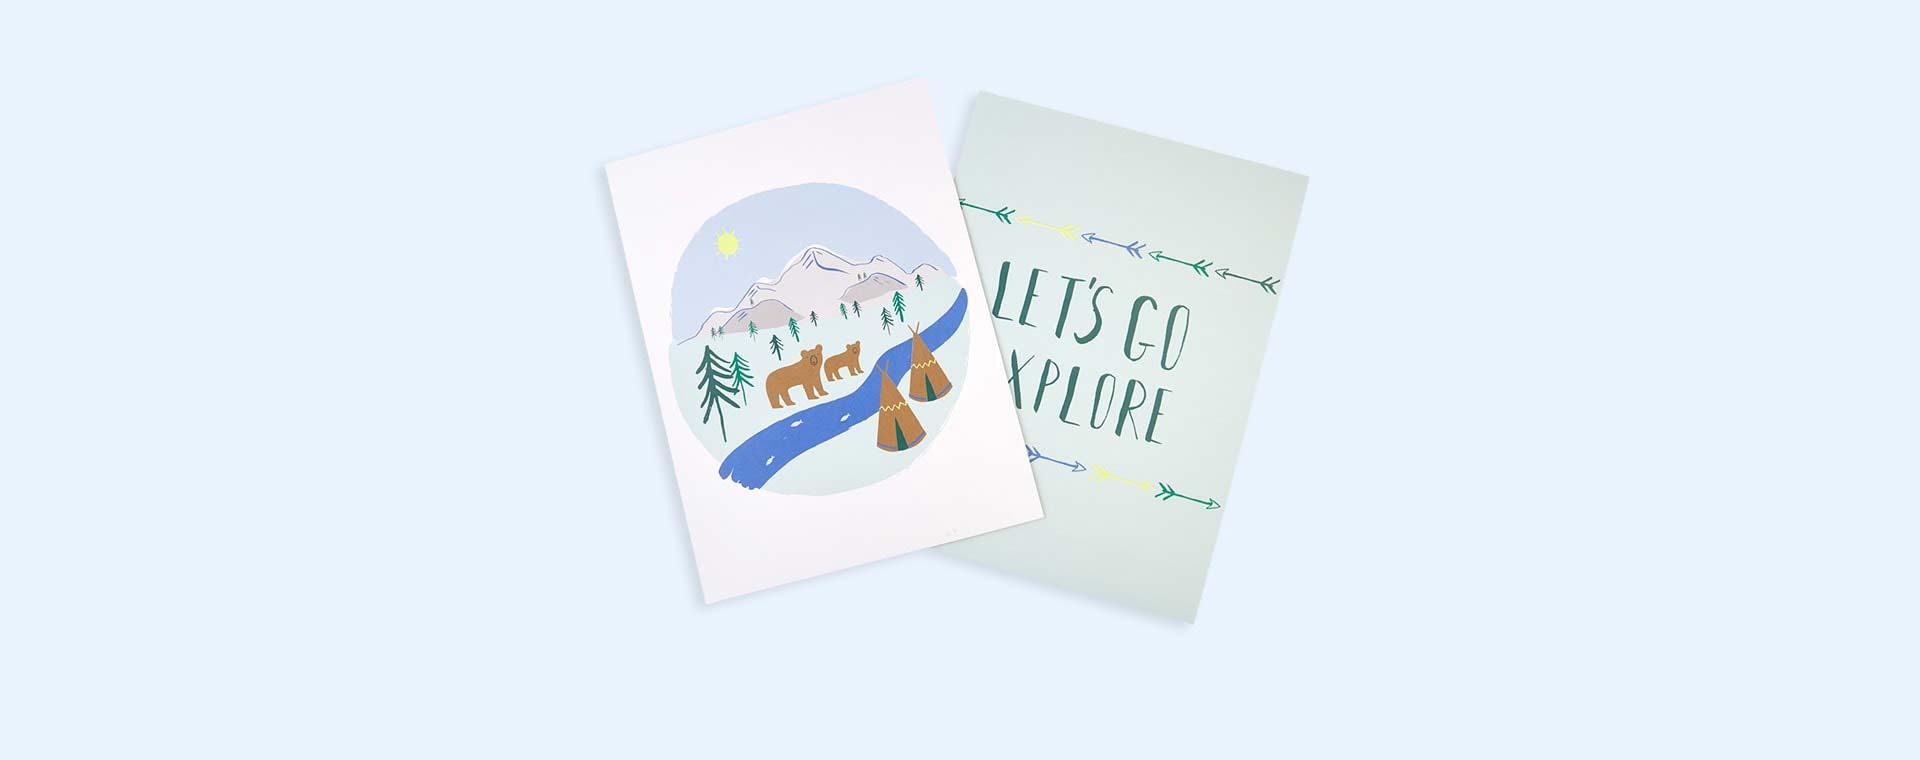 Let's Explore Meri Meri Let's Explore Art Prints